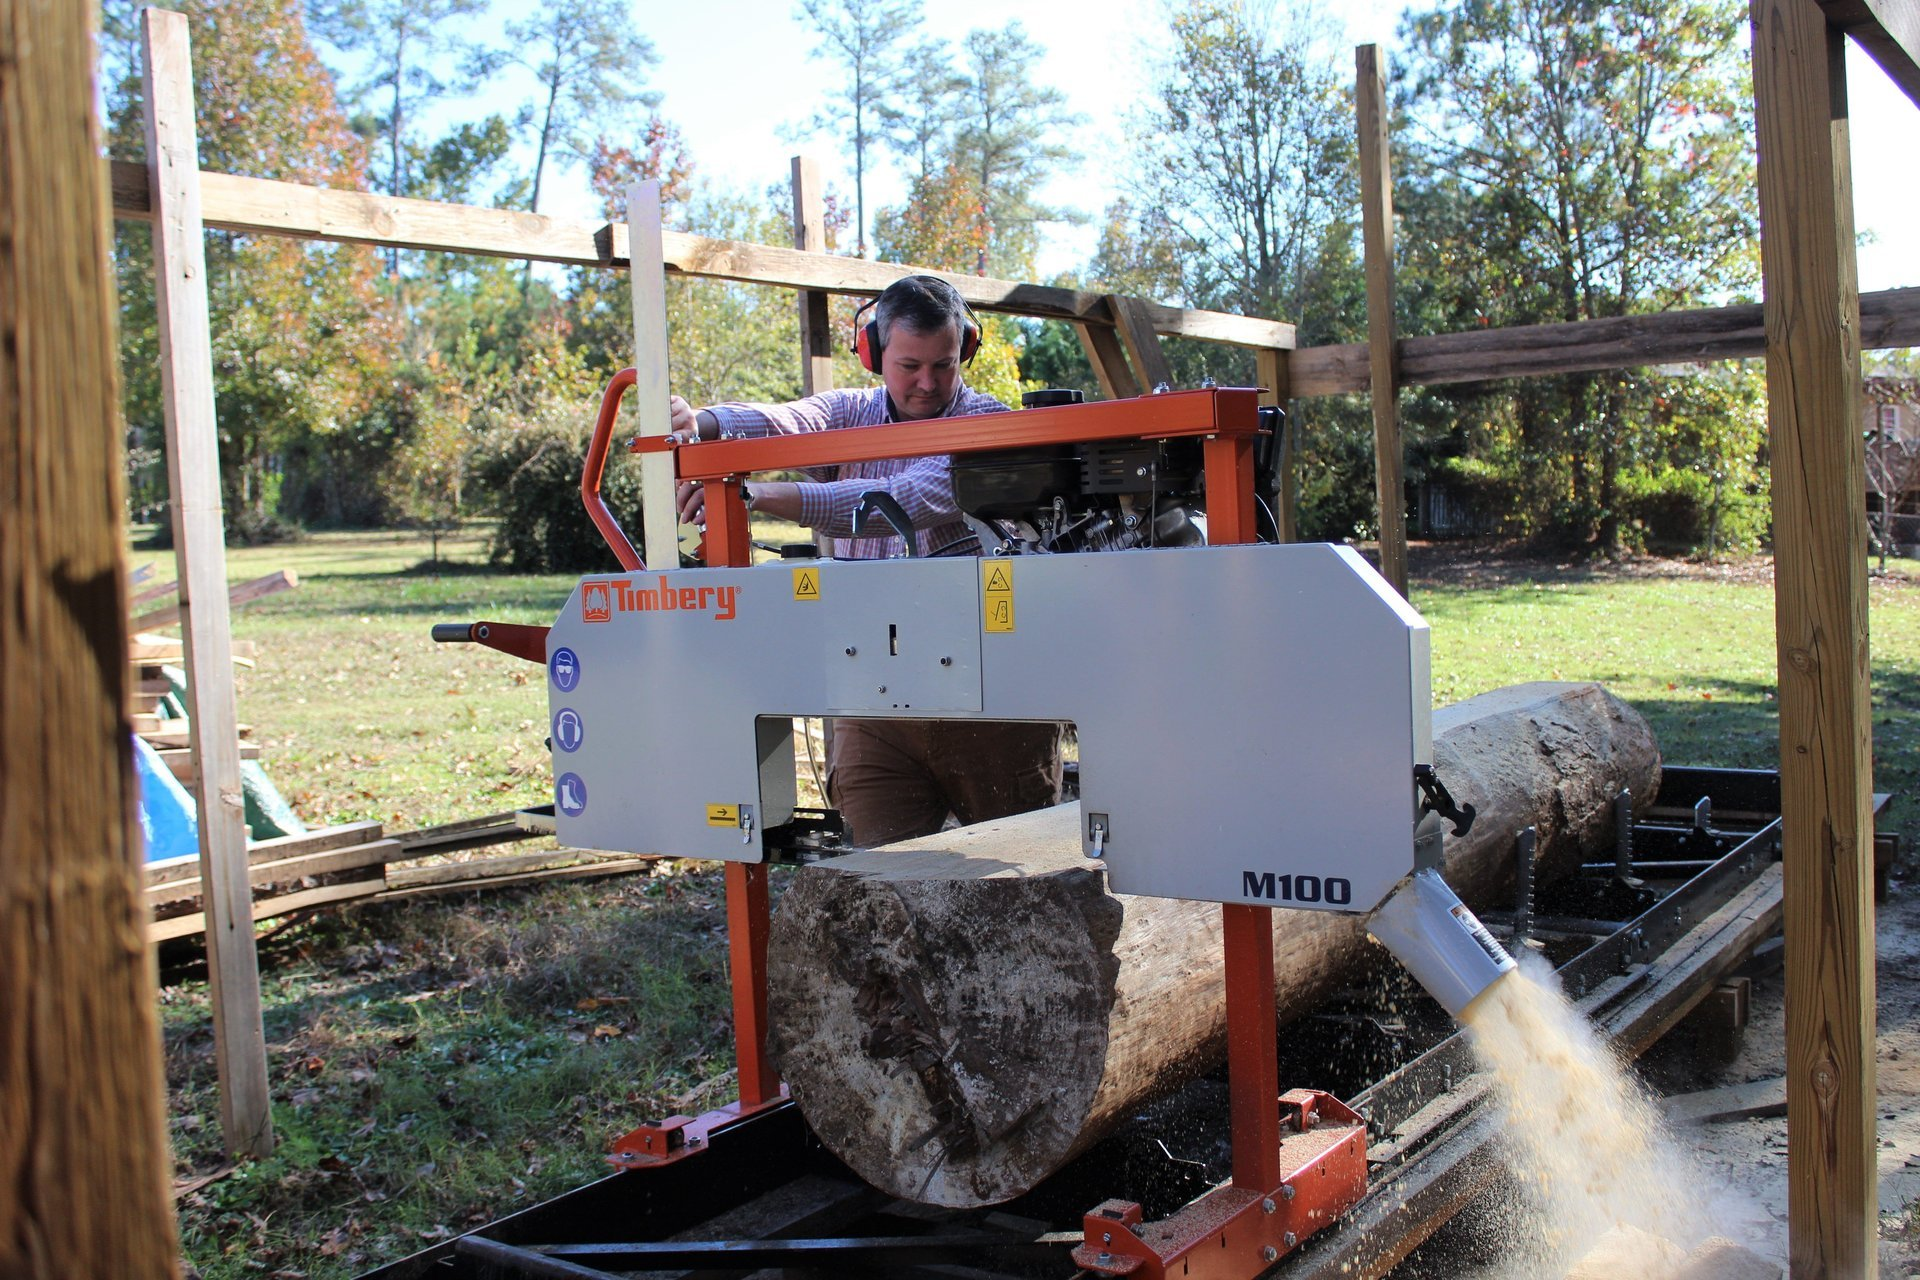 North Carolina Hobby Farmer Plans Retirement With A